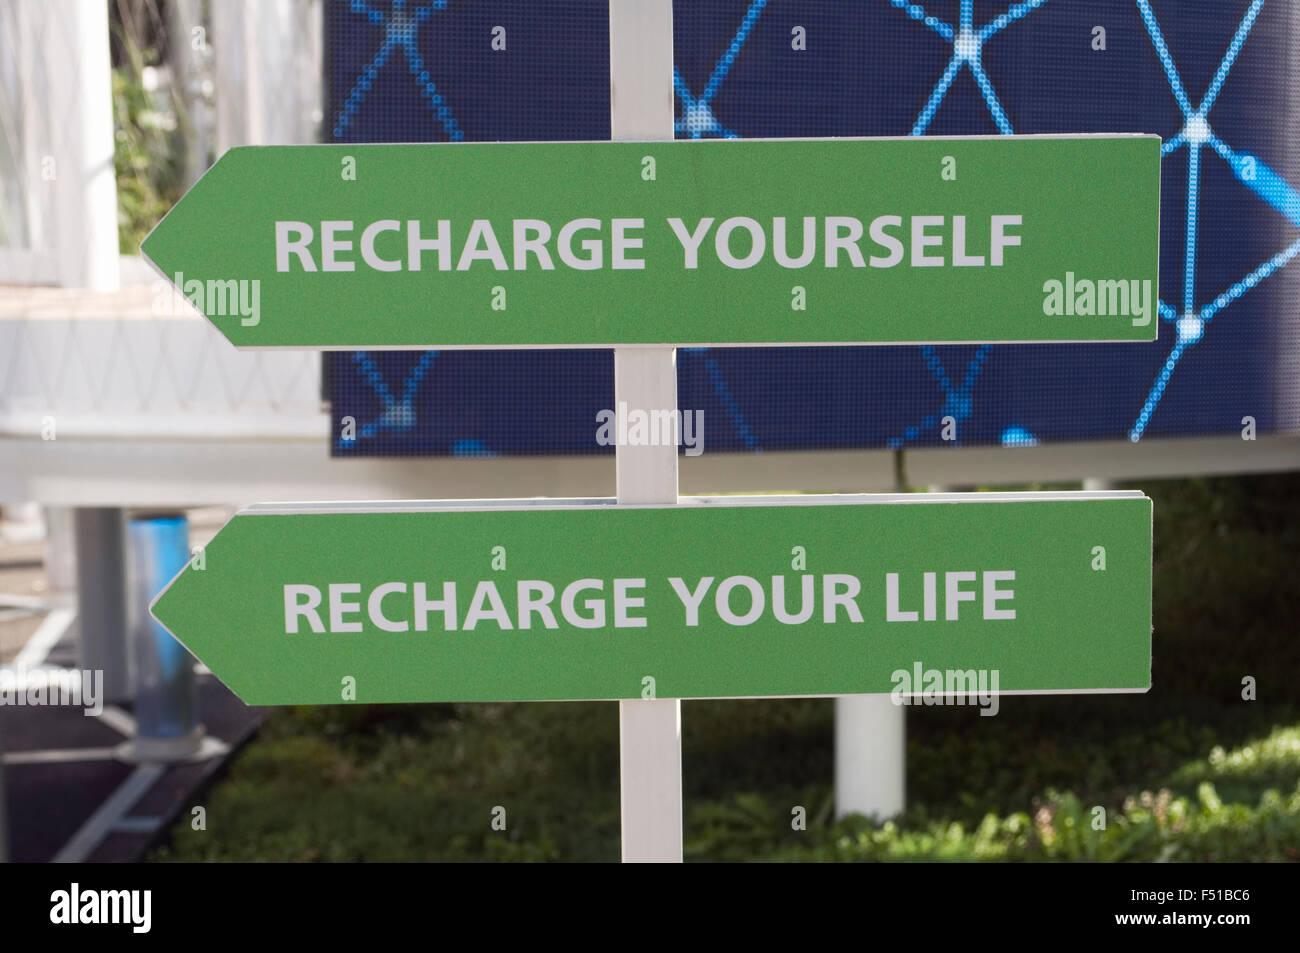 Recharge - Stock Image